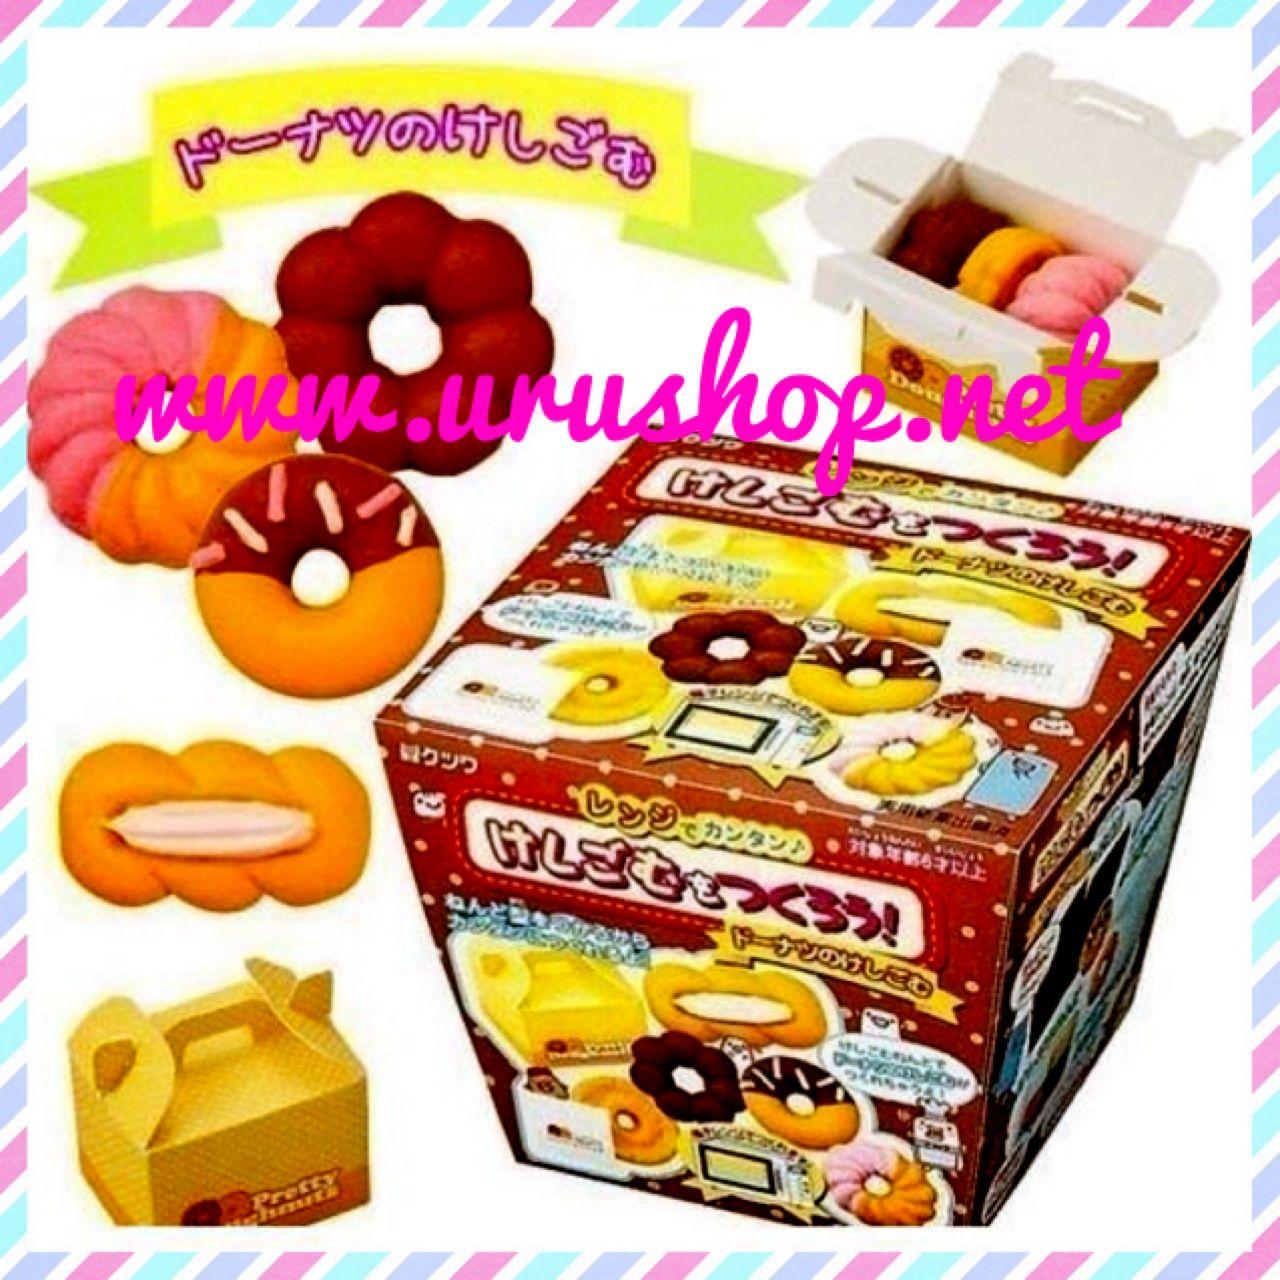 Diy kutsuwa eraser donut diy eraser kutsuwa pinterest diy kutsuwa eraser donut solutioingenieria Images